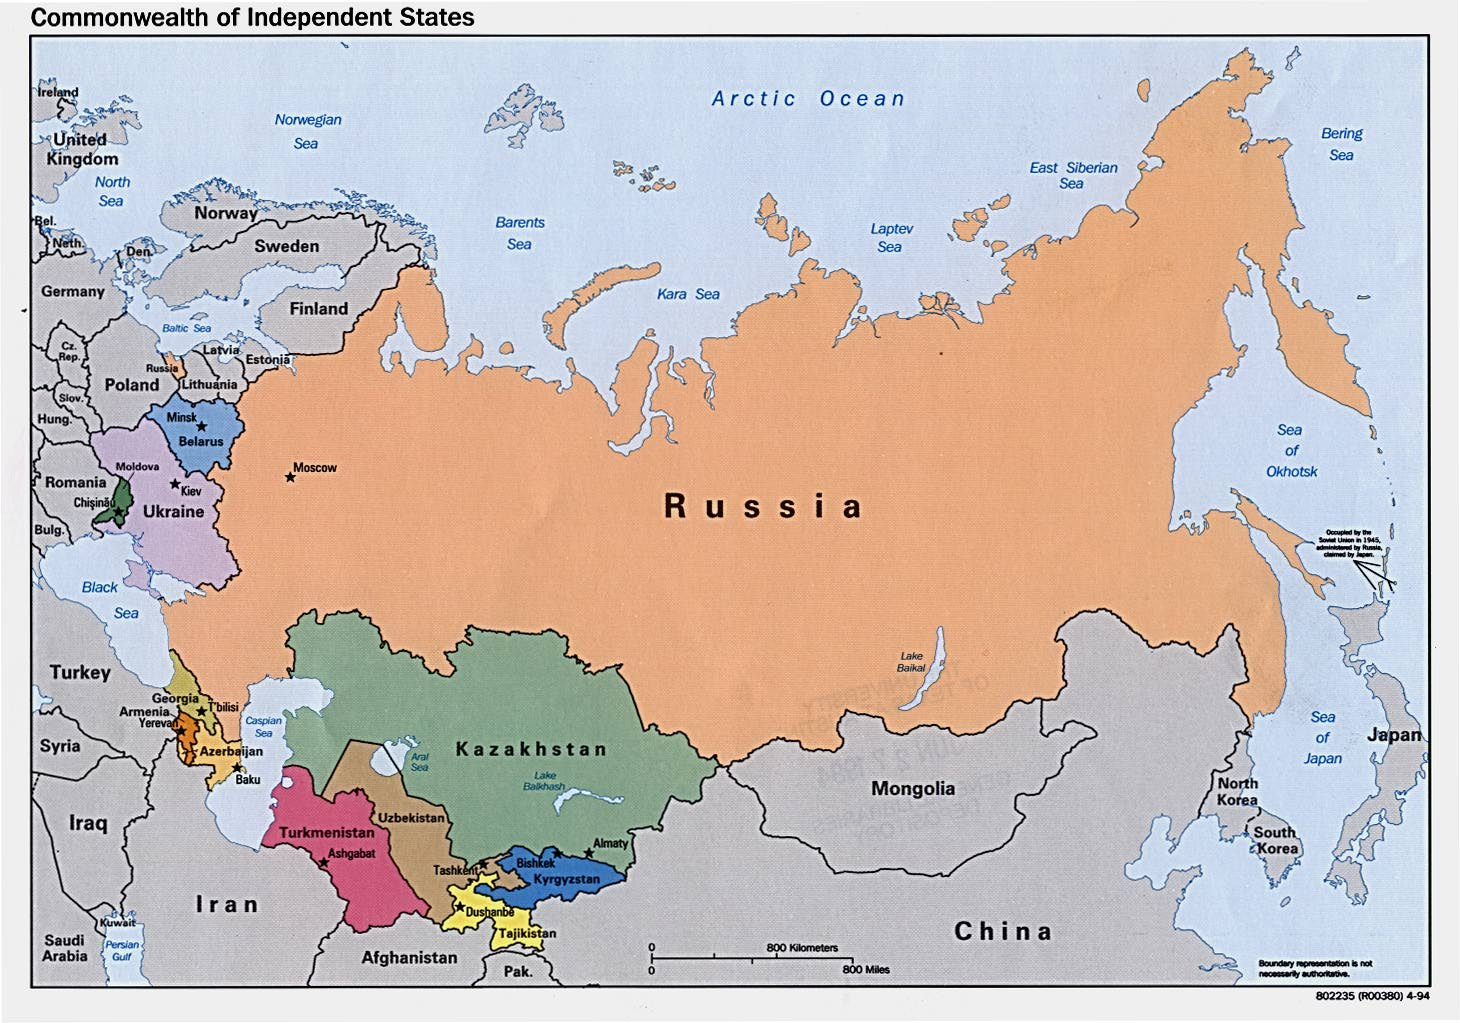 karta över ryssland Karta över Ryssland Stora bild | Karta över Sverige, Geografisk  karta över ryssland